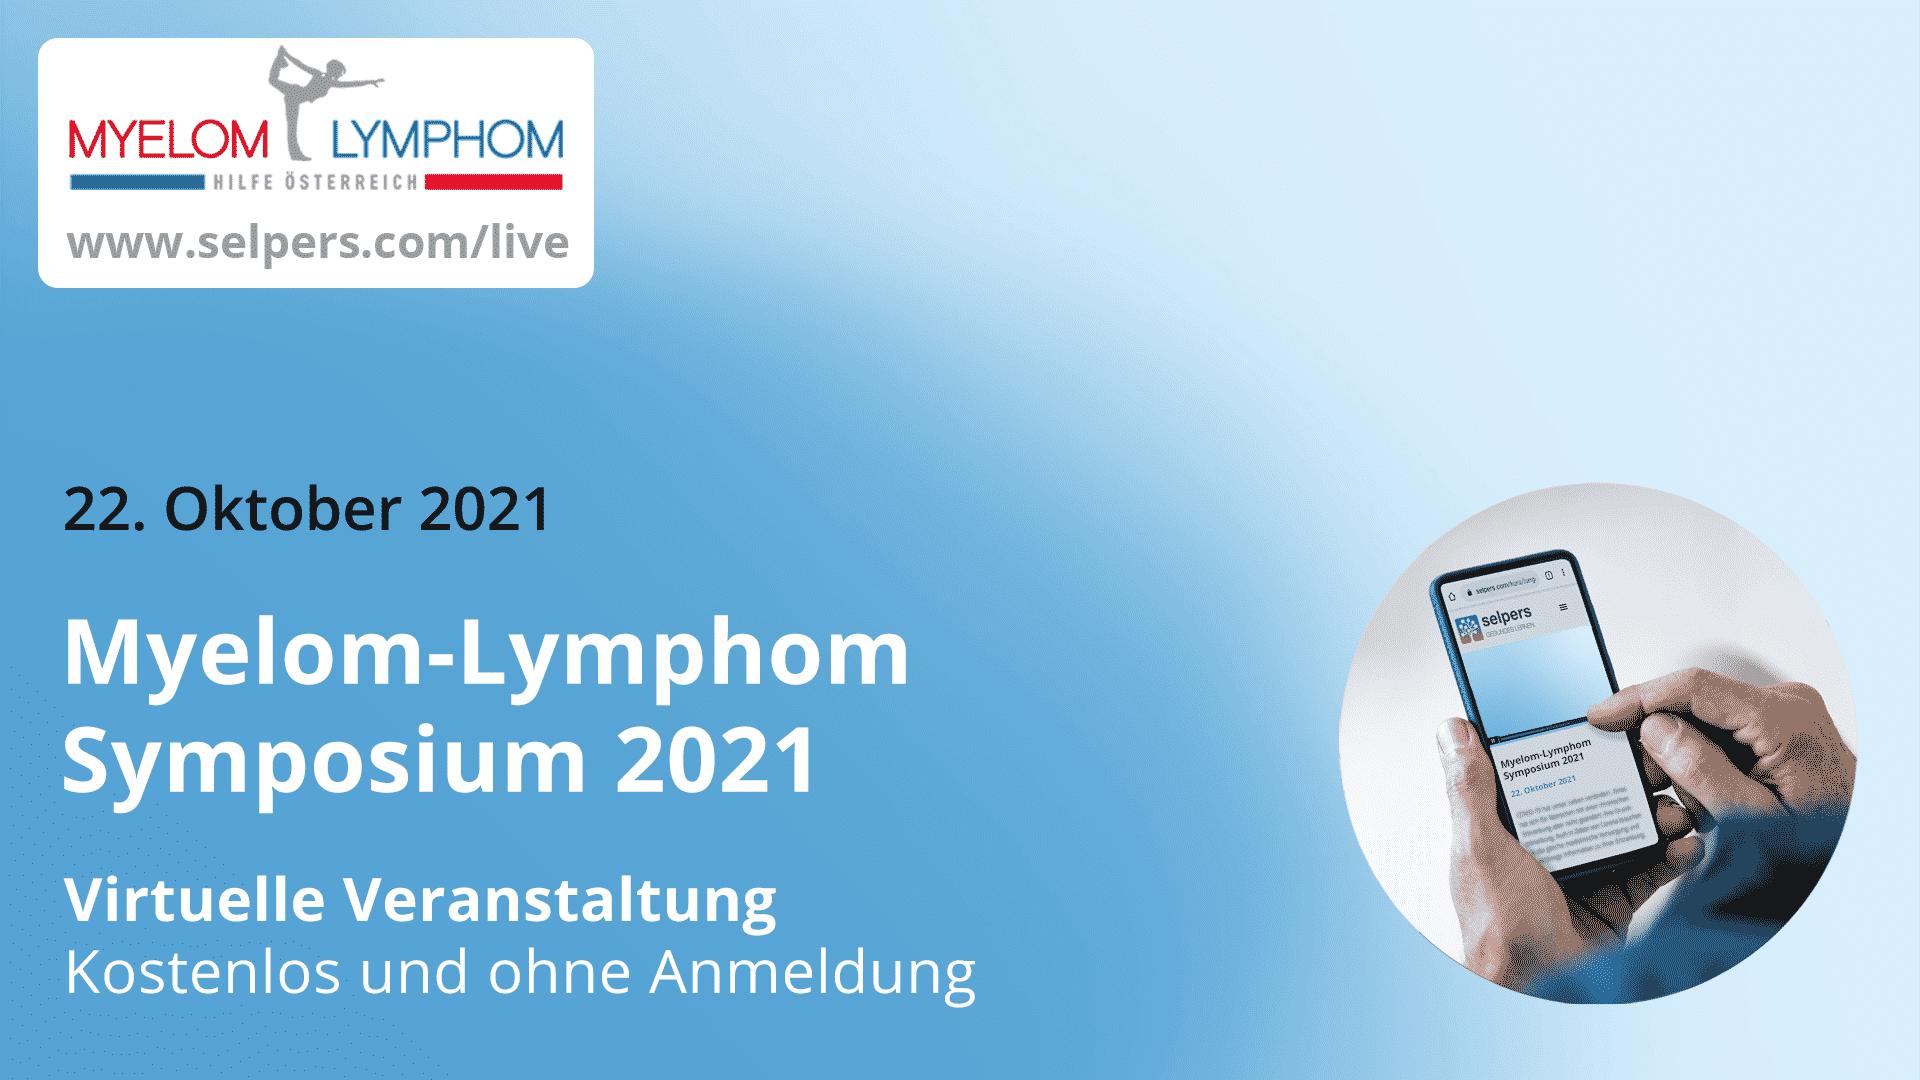 Myelom-Lymphom-Symposium 2021